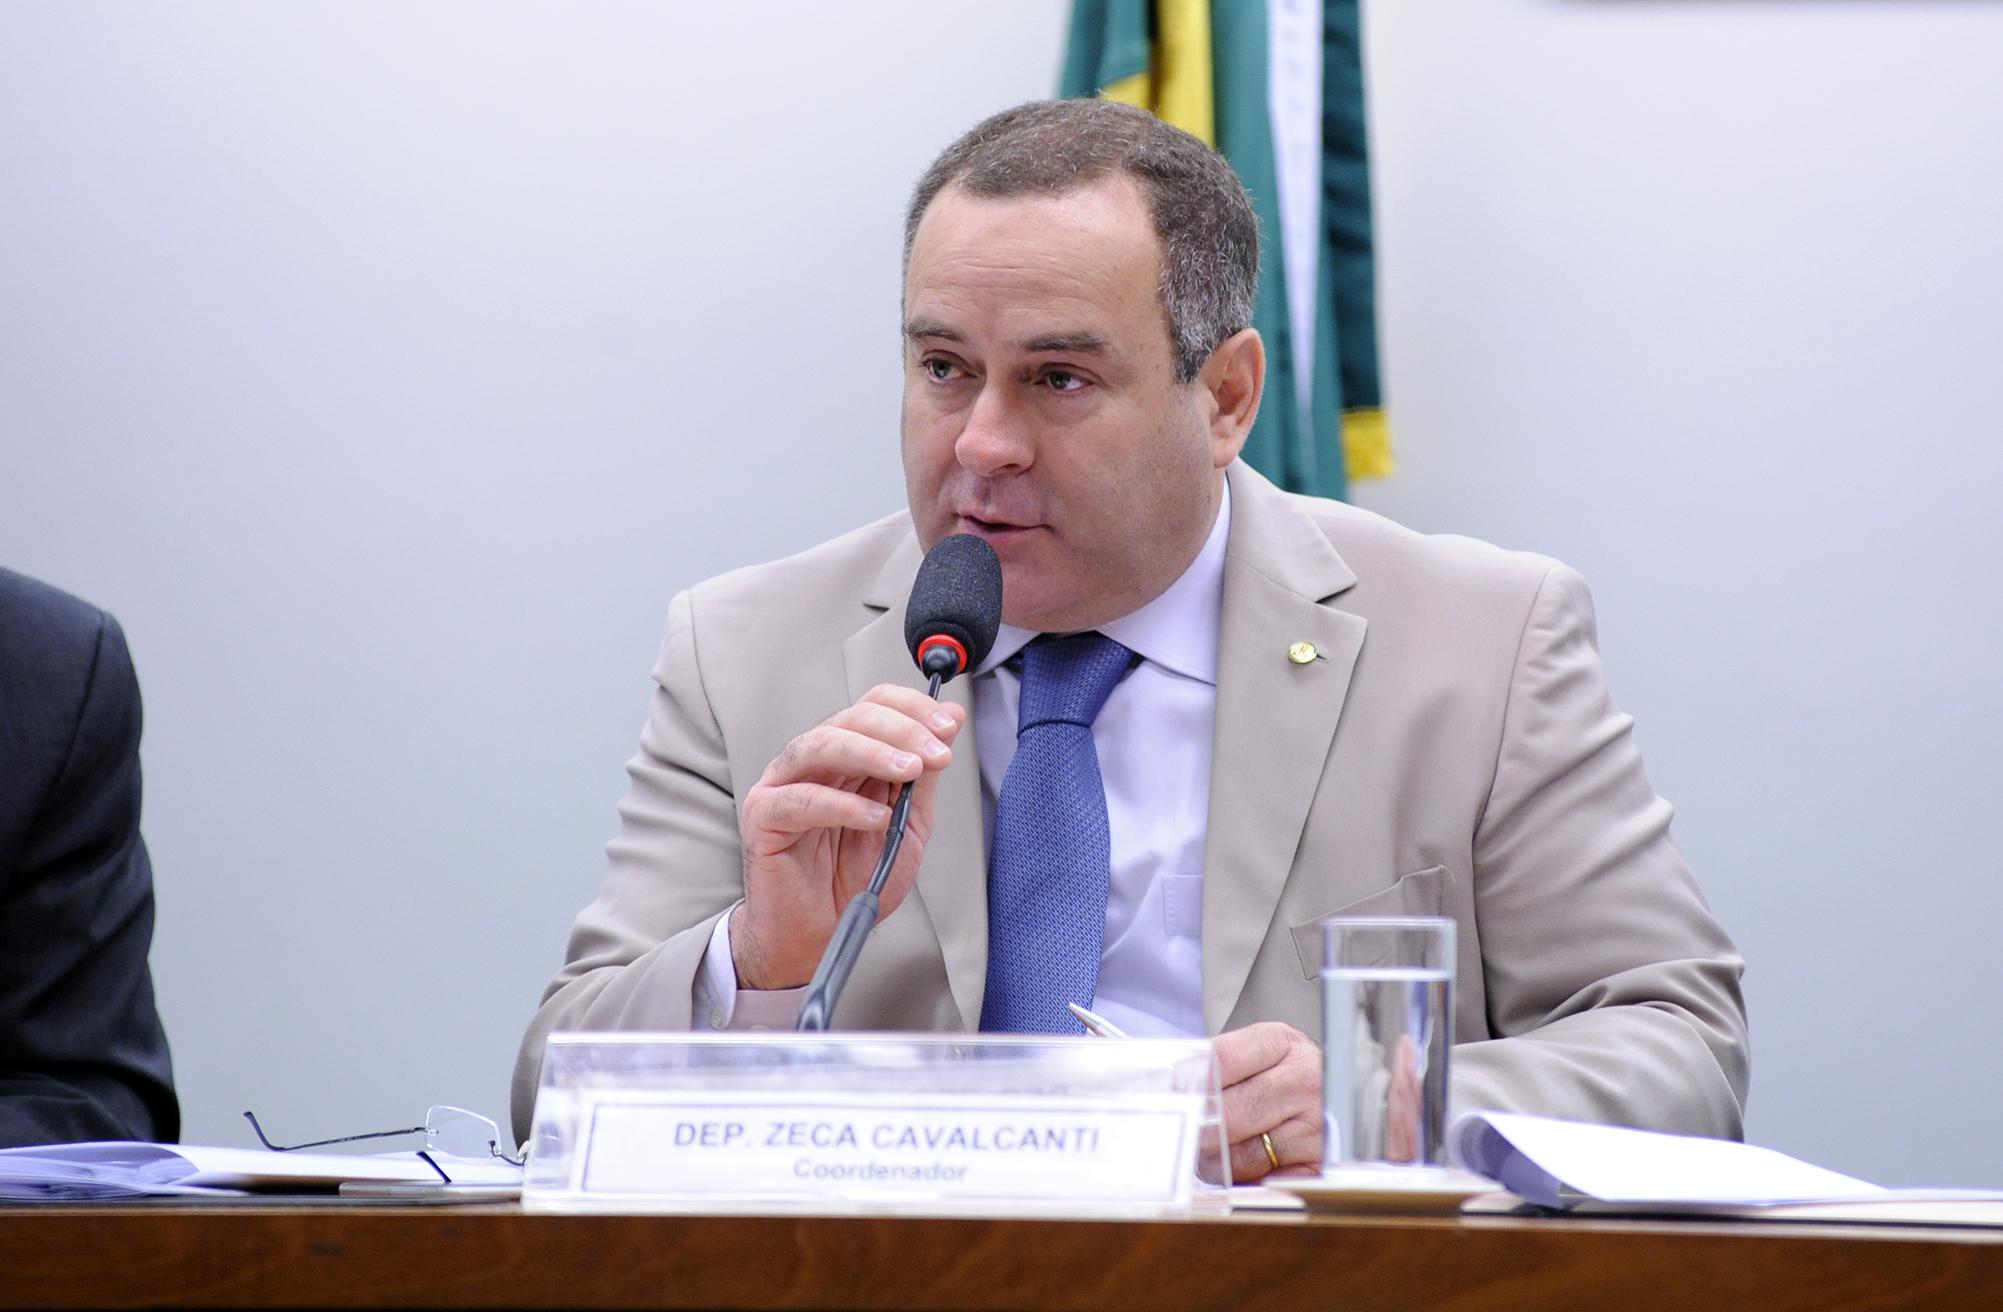 Zeca Cavalcanti